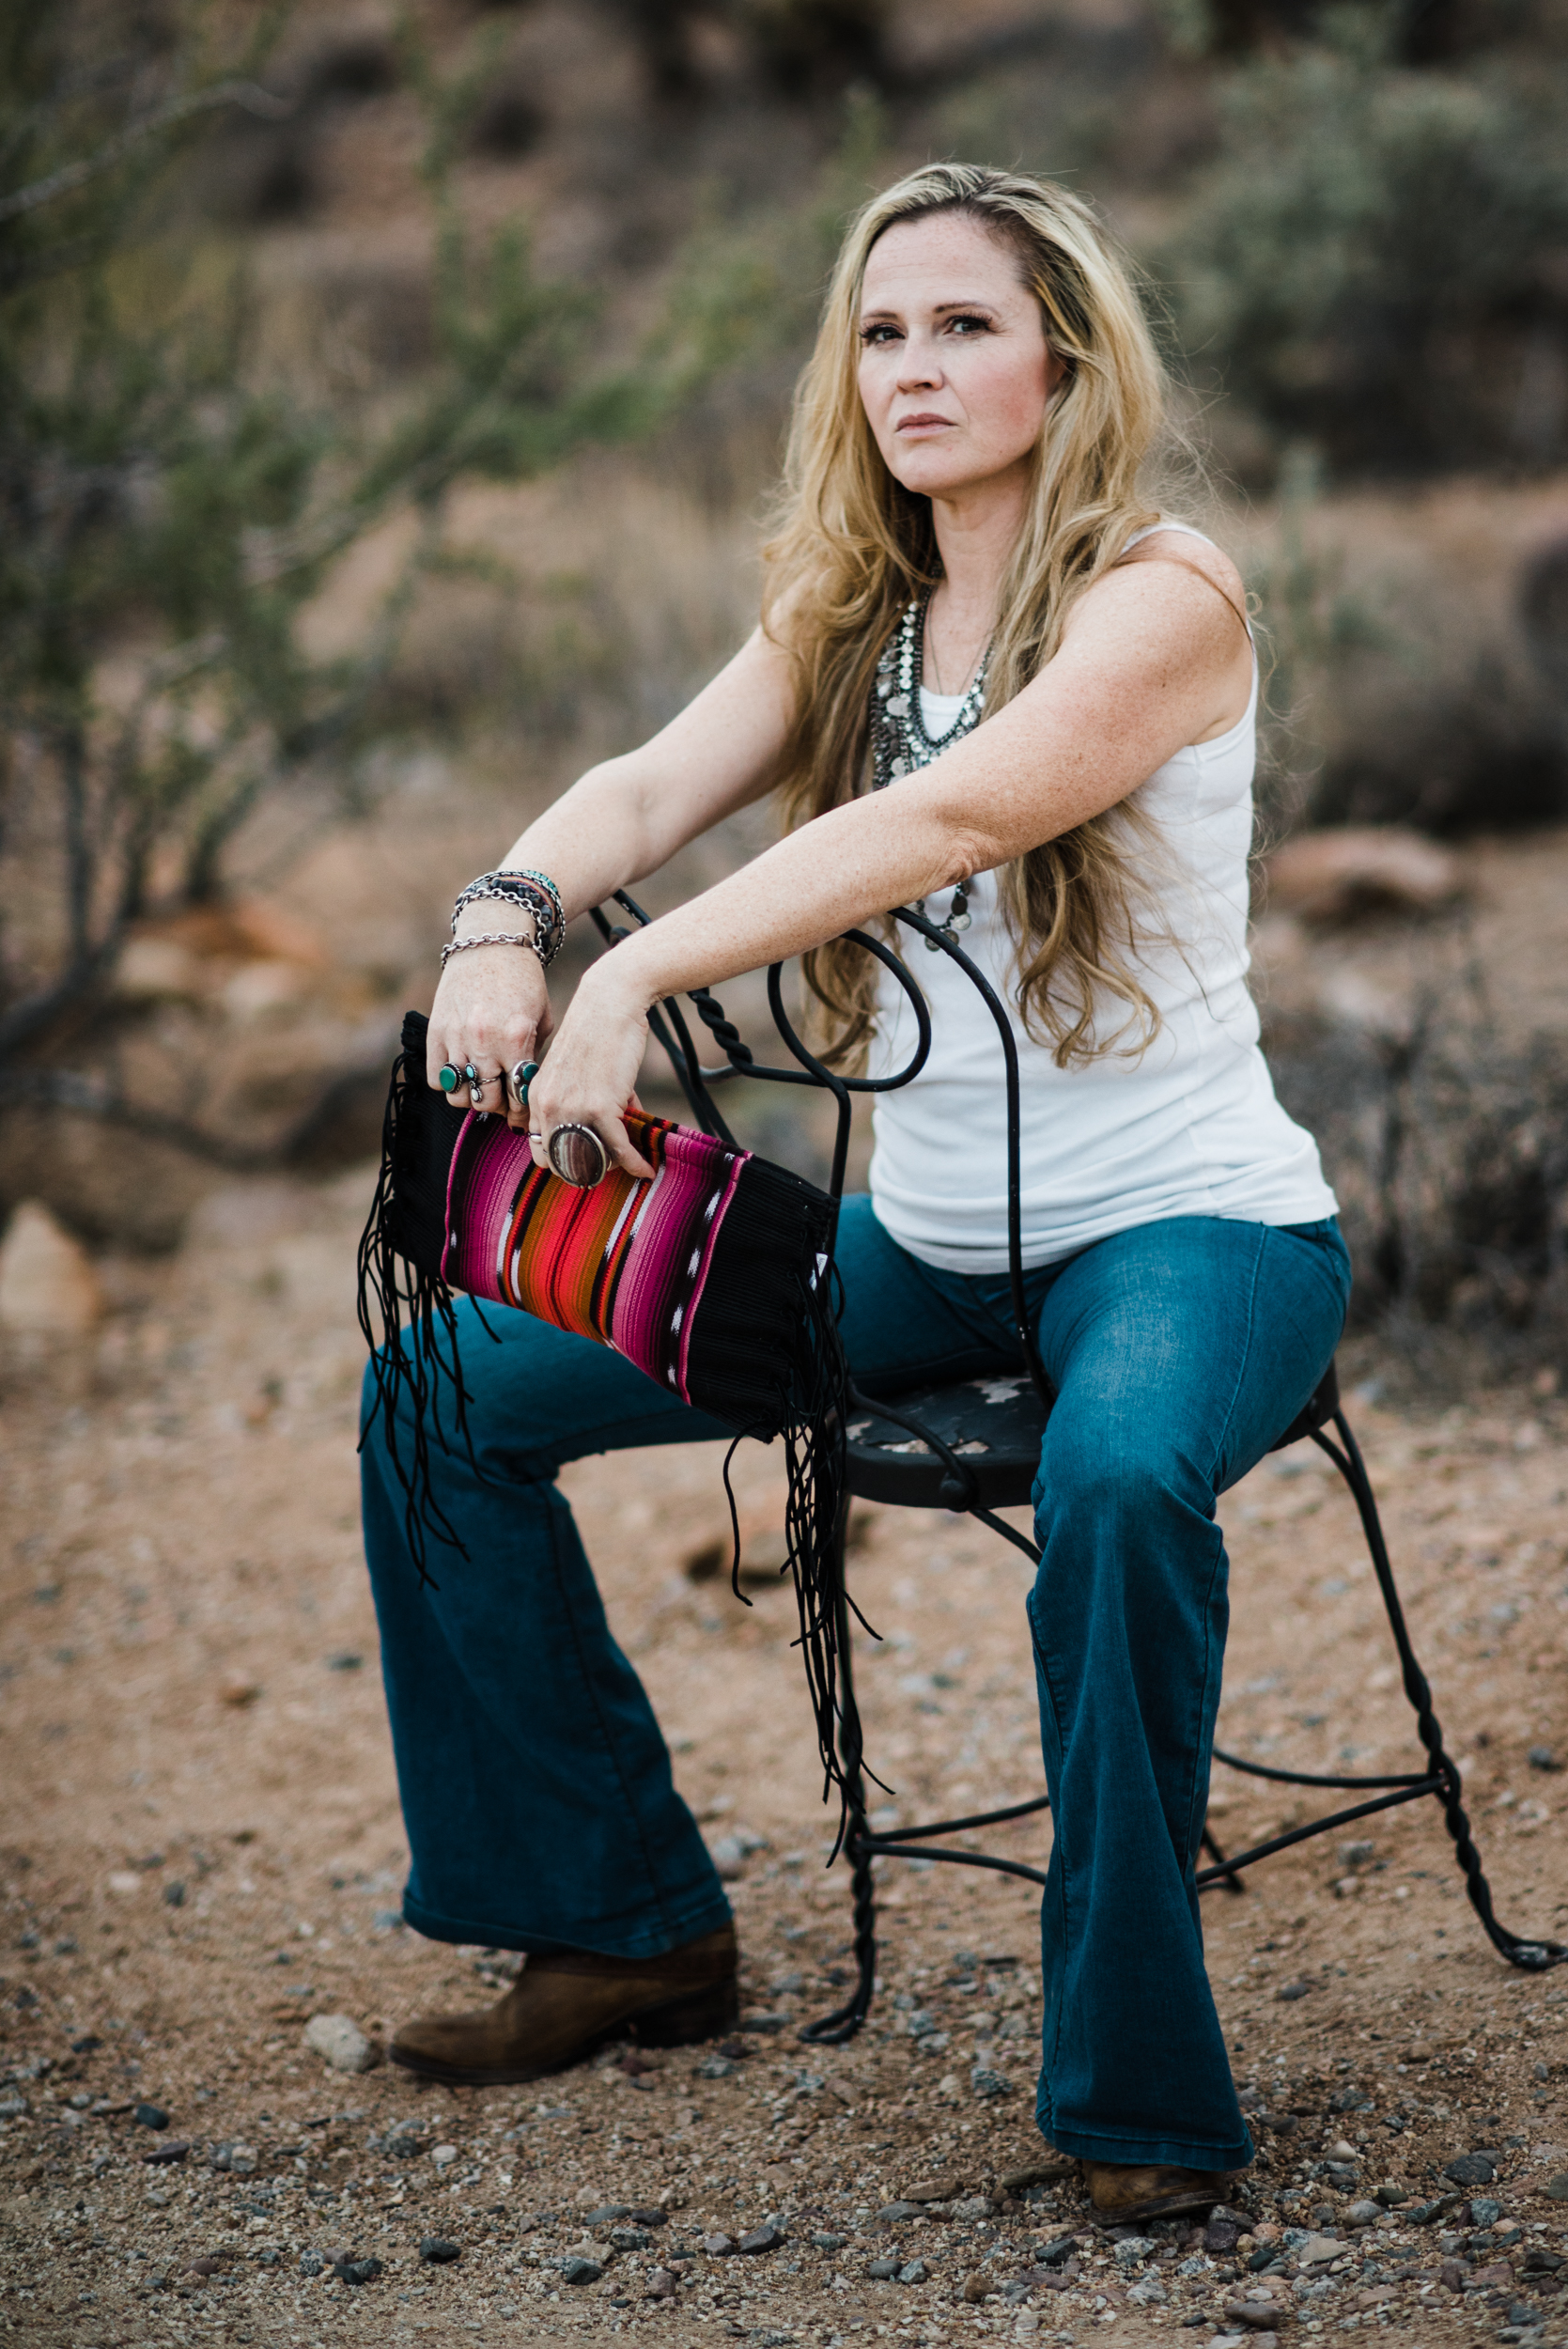 Arizona-love-hippie-momma-bags-boho-20.jpg